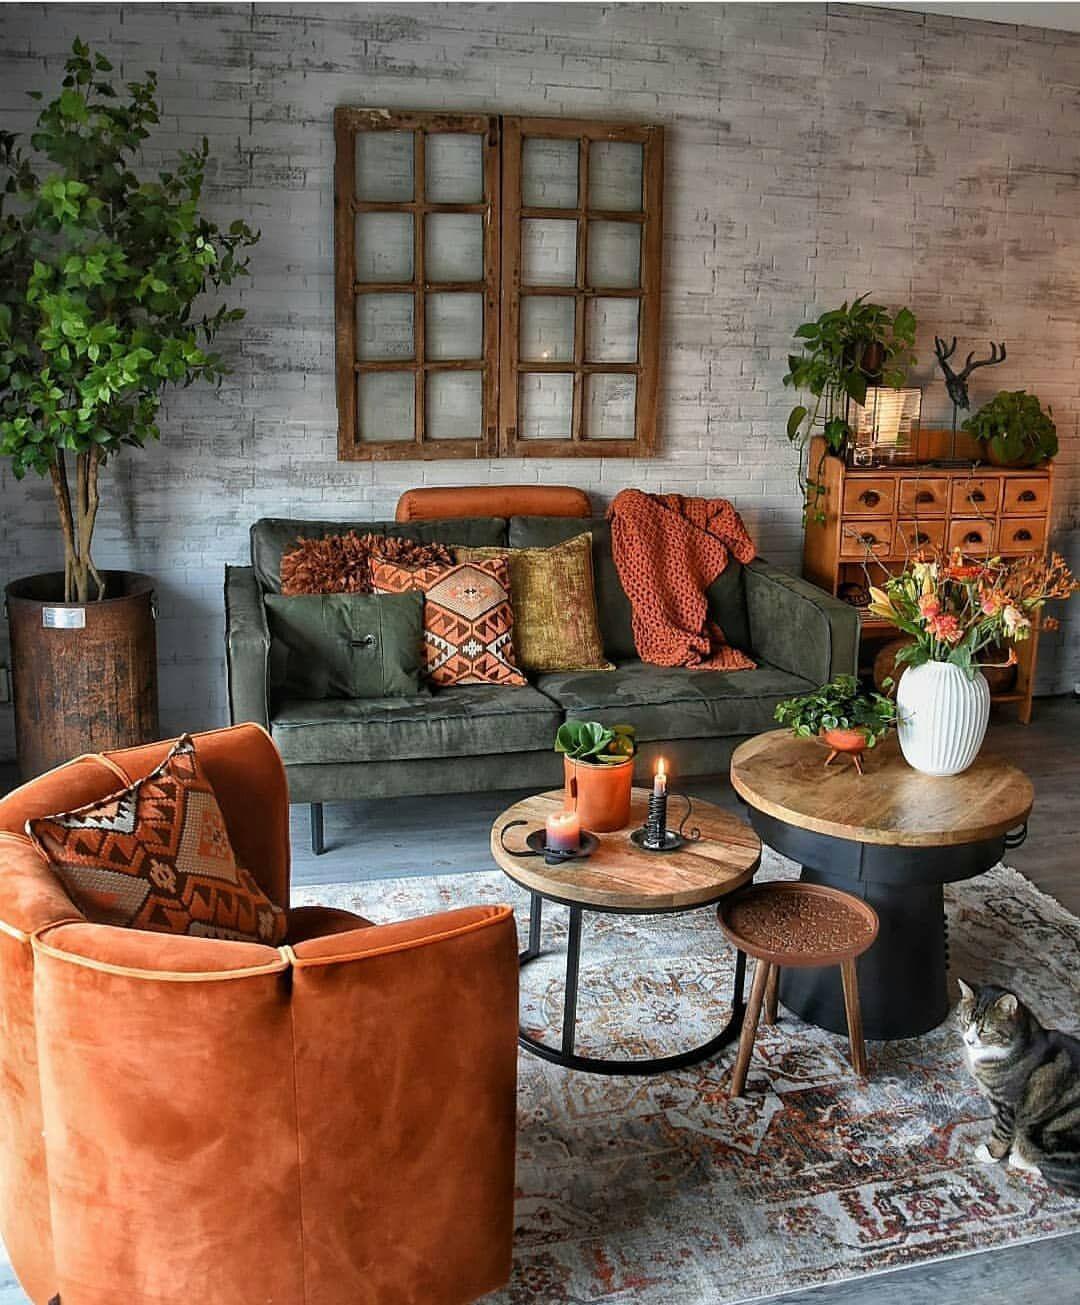 New traditional decoration ideas with indoor plants❤ ????کیا تو منزل یا محل کارشون گیاه دارند؟؟ بنظرتون استفاده از گیاه در فضا و دکوراسیون چه… #livingroomcolorschemeideas